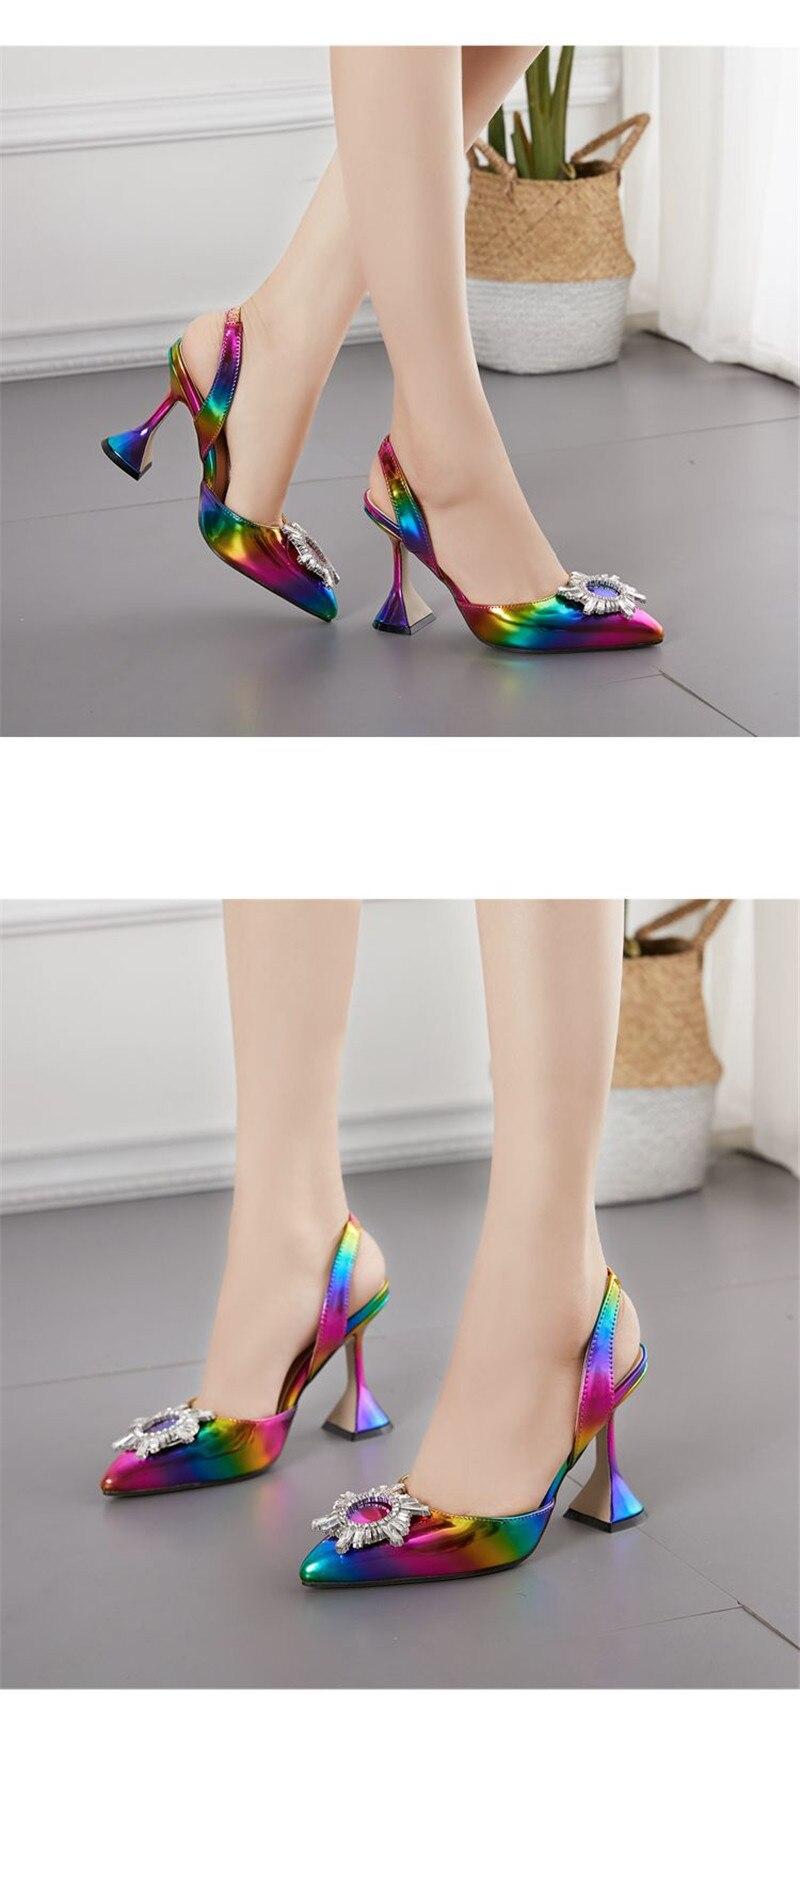 Summer 2020 Sandals Women`s Shoes Colorful High Heel Slingbacks Sun Flower Rhinestone Shallow Mouth Women`s Sandals Plus Size 42 (3)